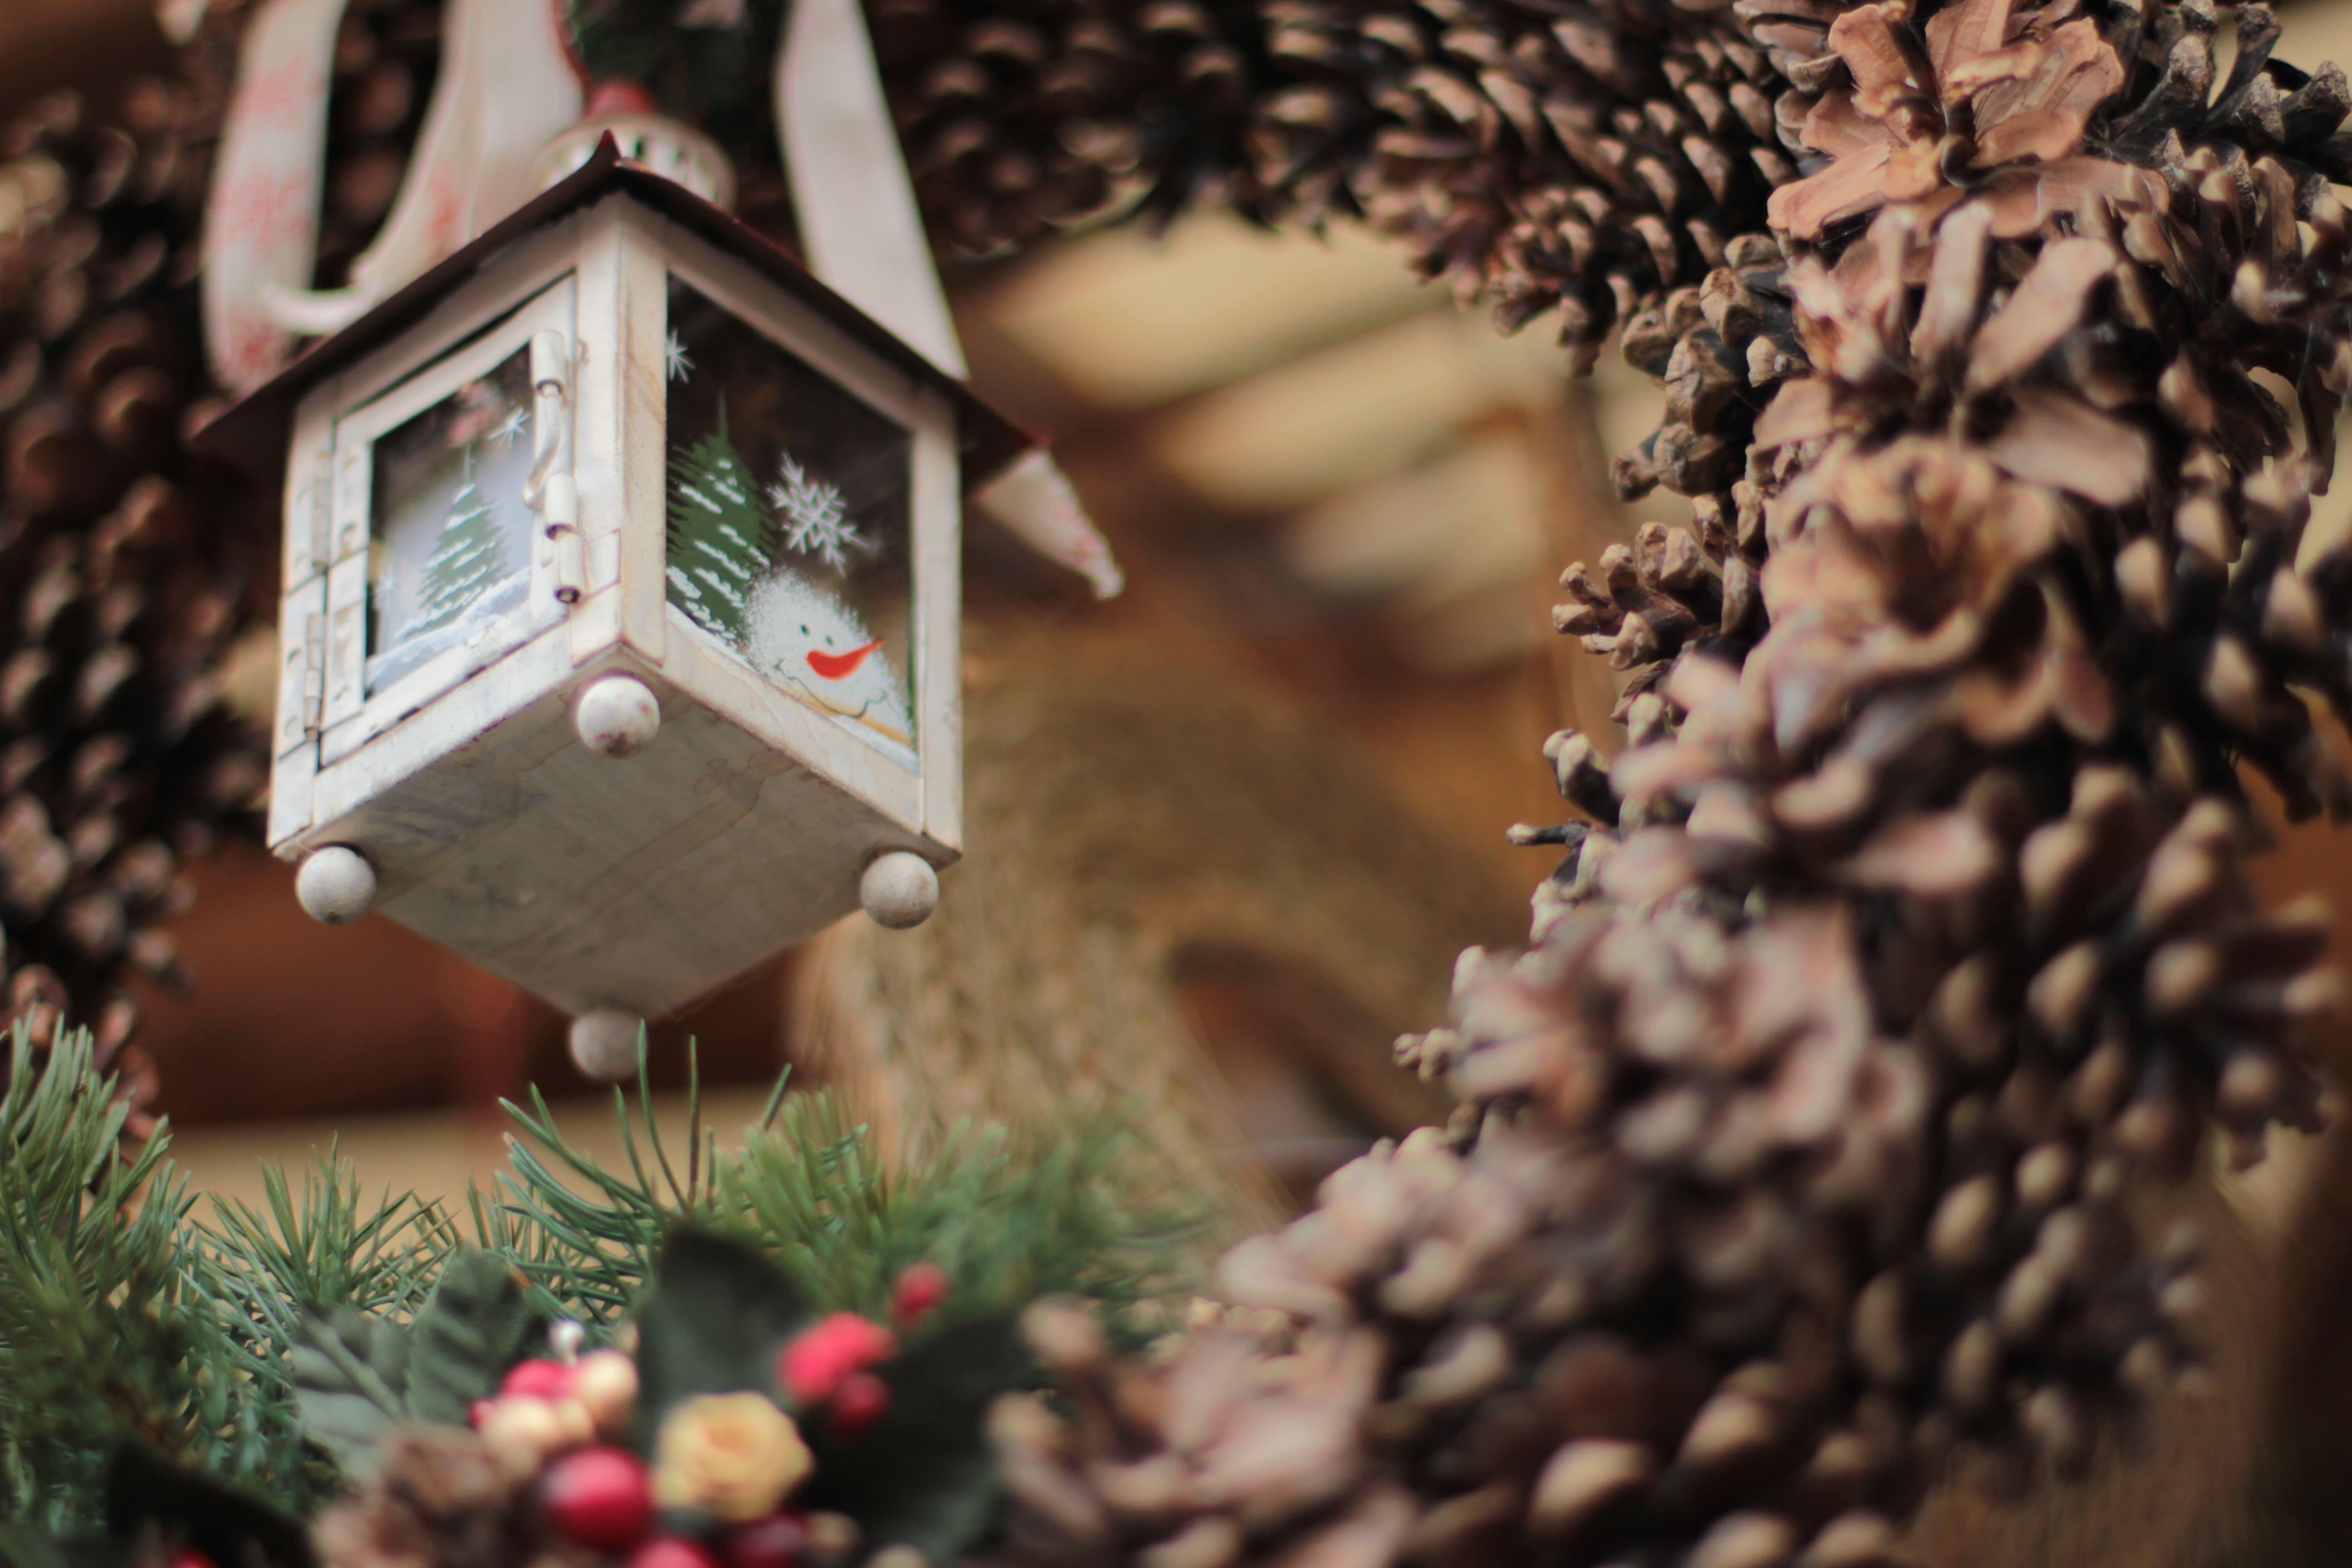 Regali di Natale da mercatini